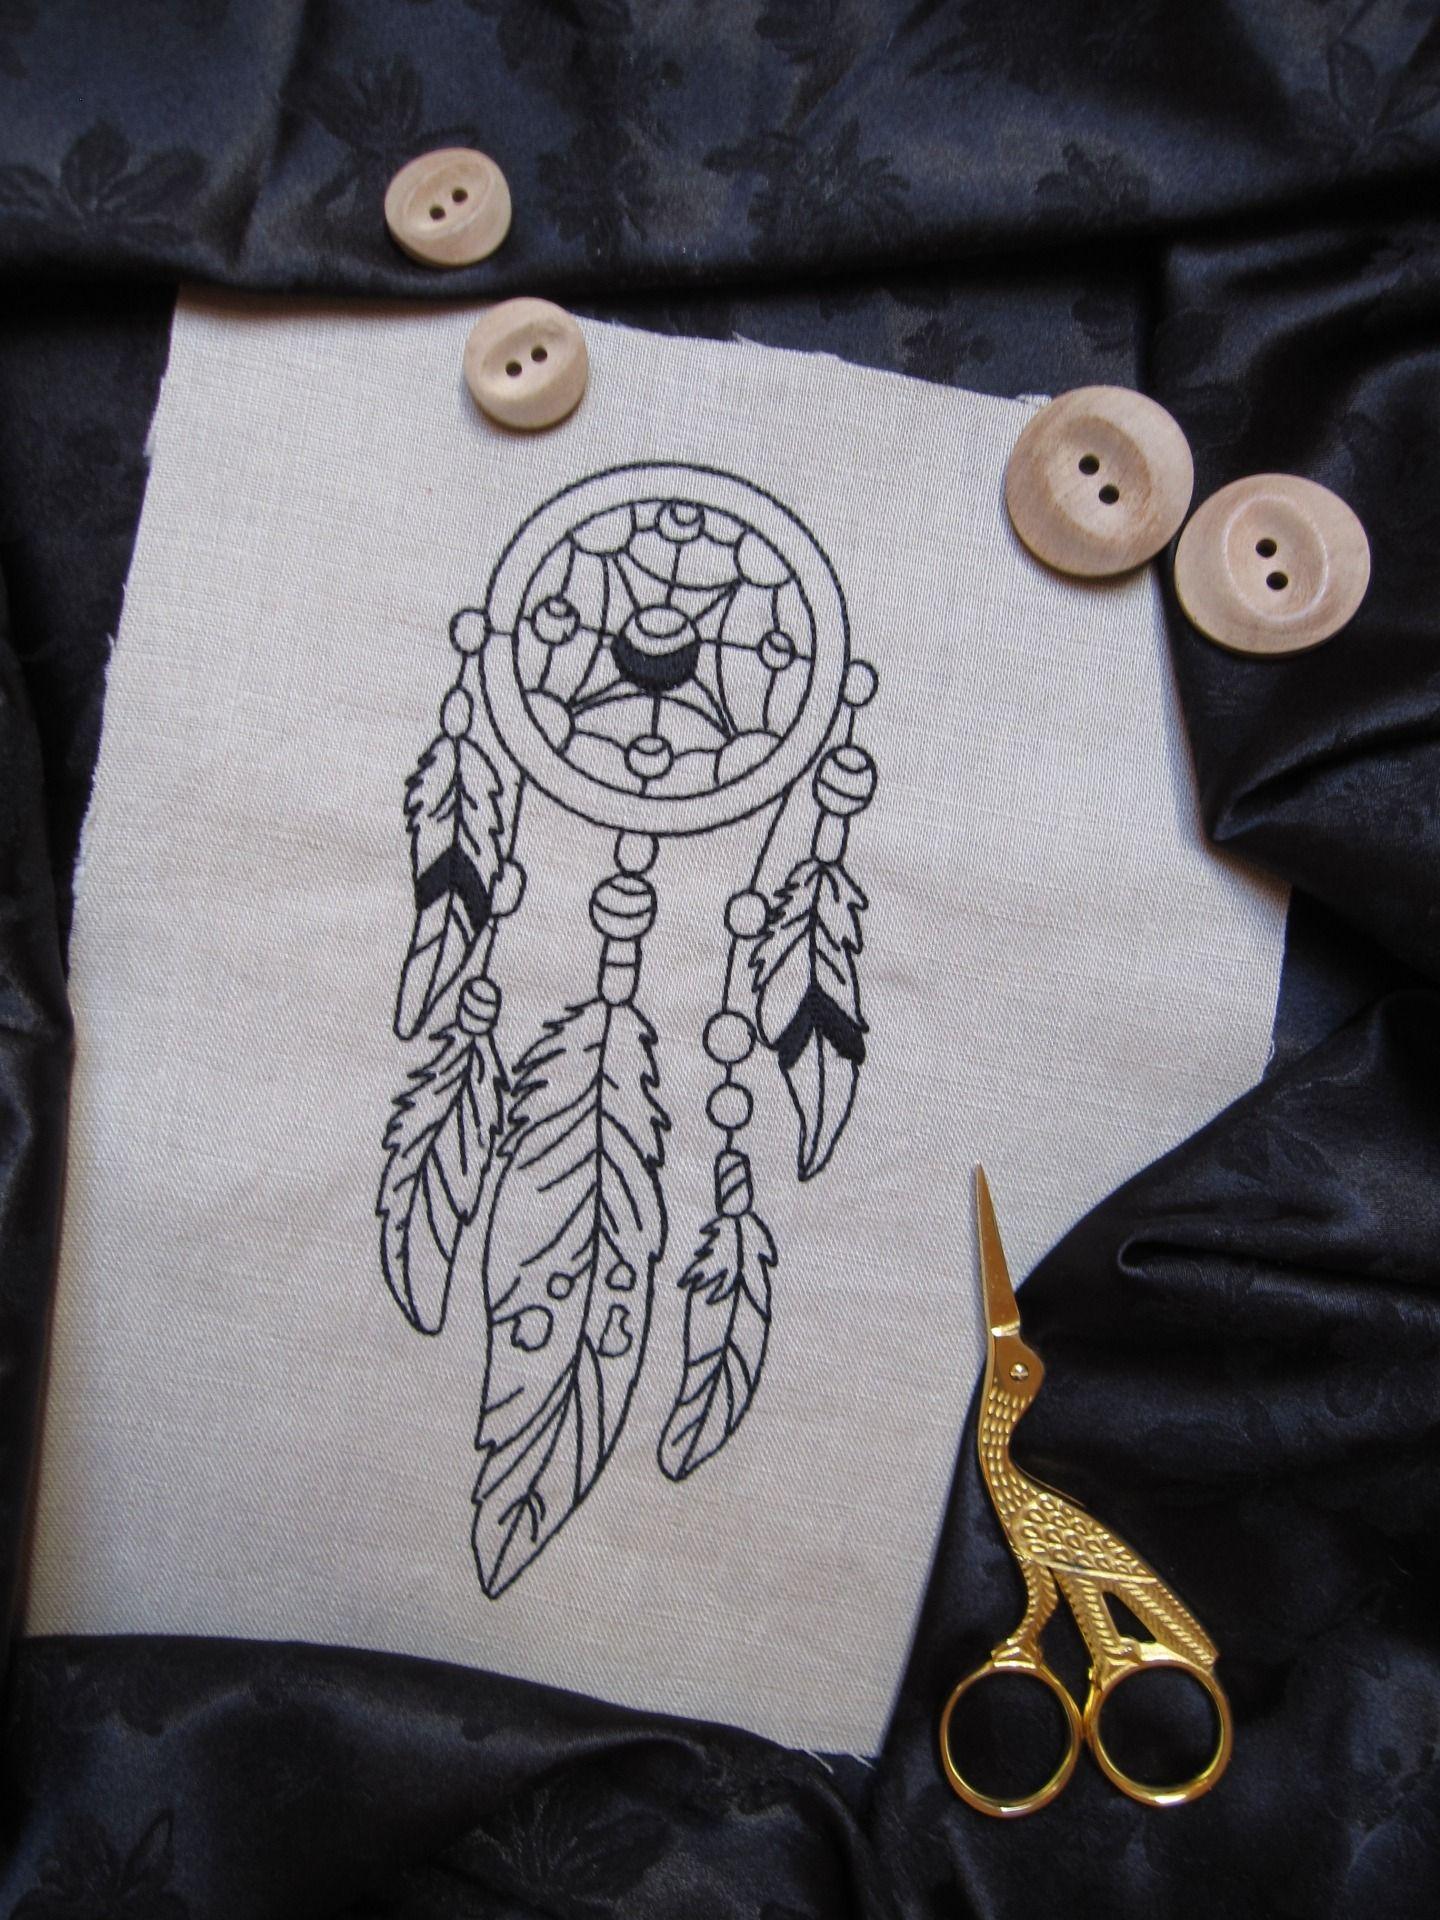 attrape reves tatouage pinterest collage illustration. Black Bedroom Furniture Sets. Home Design Ideas